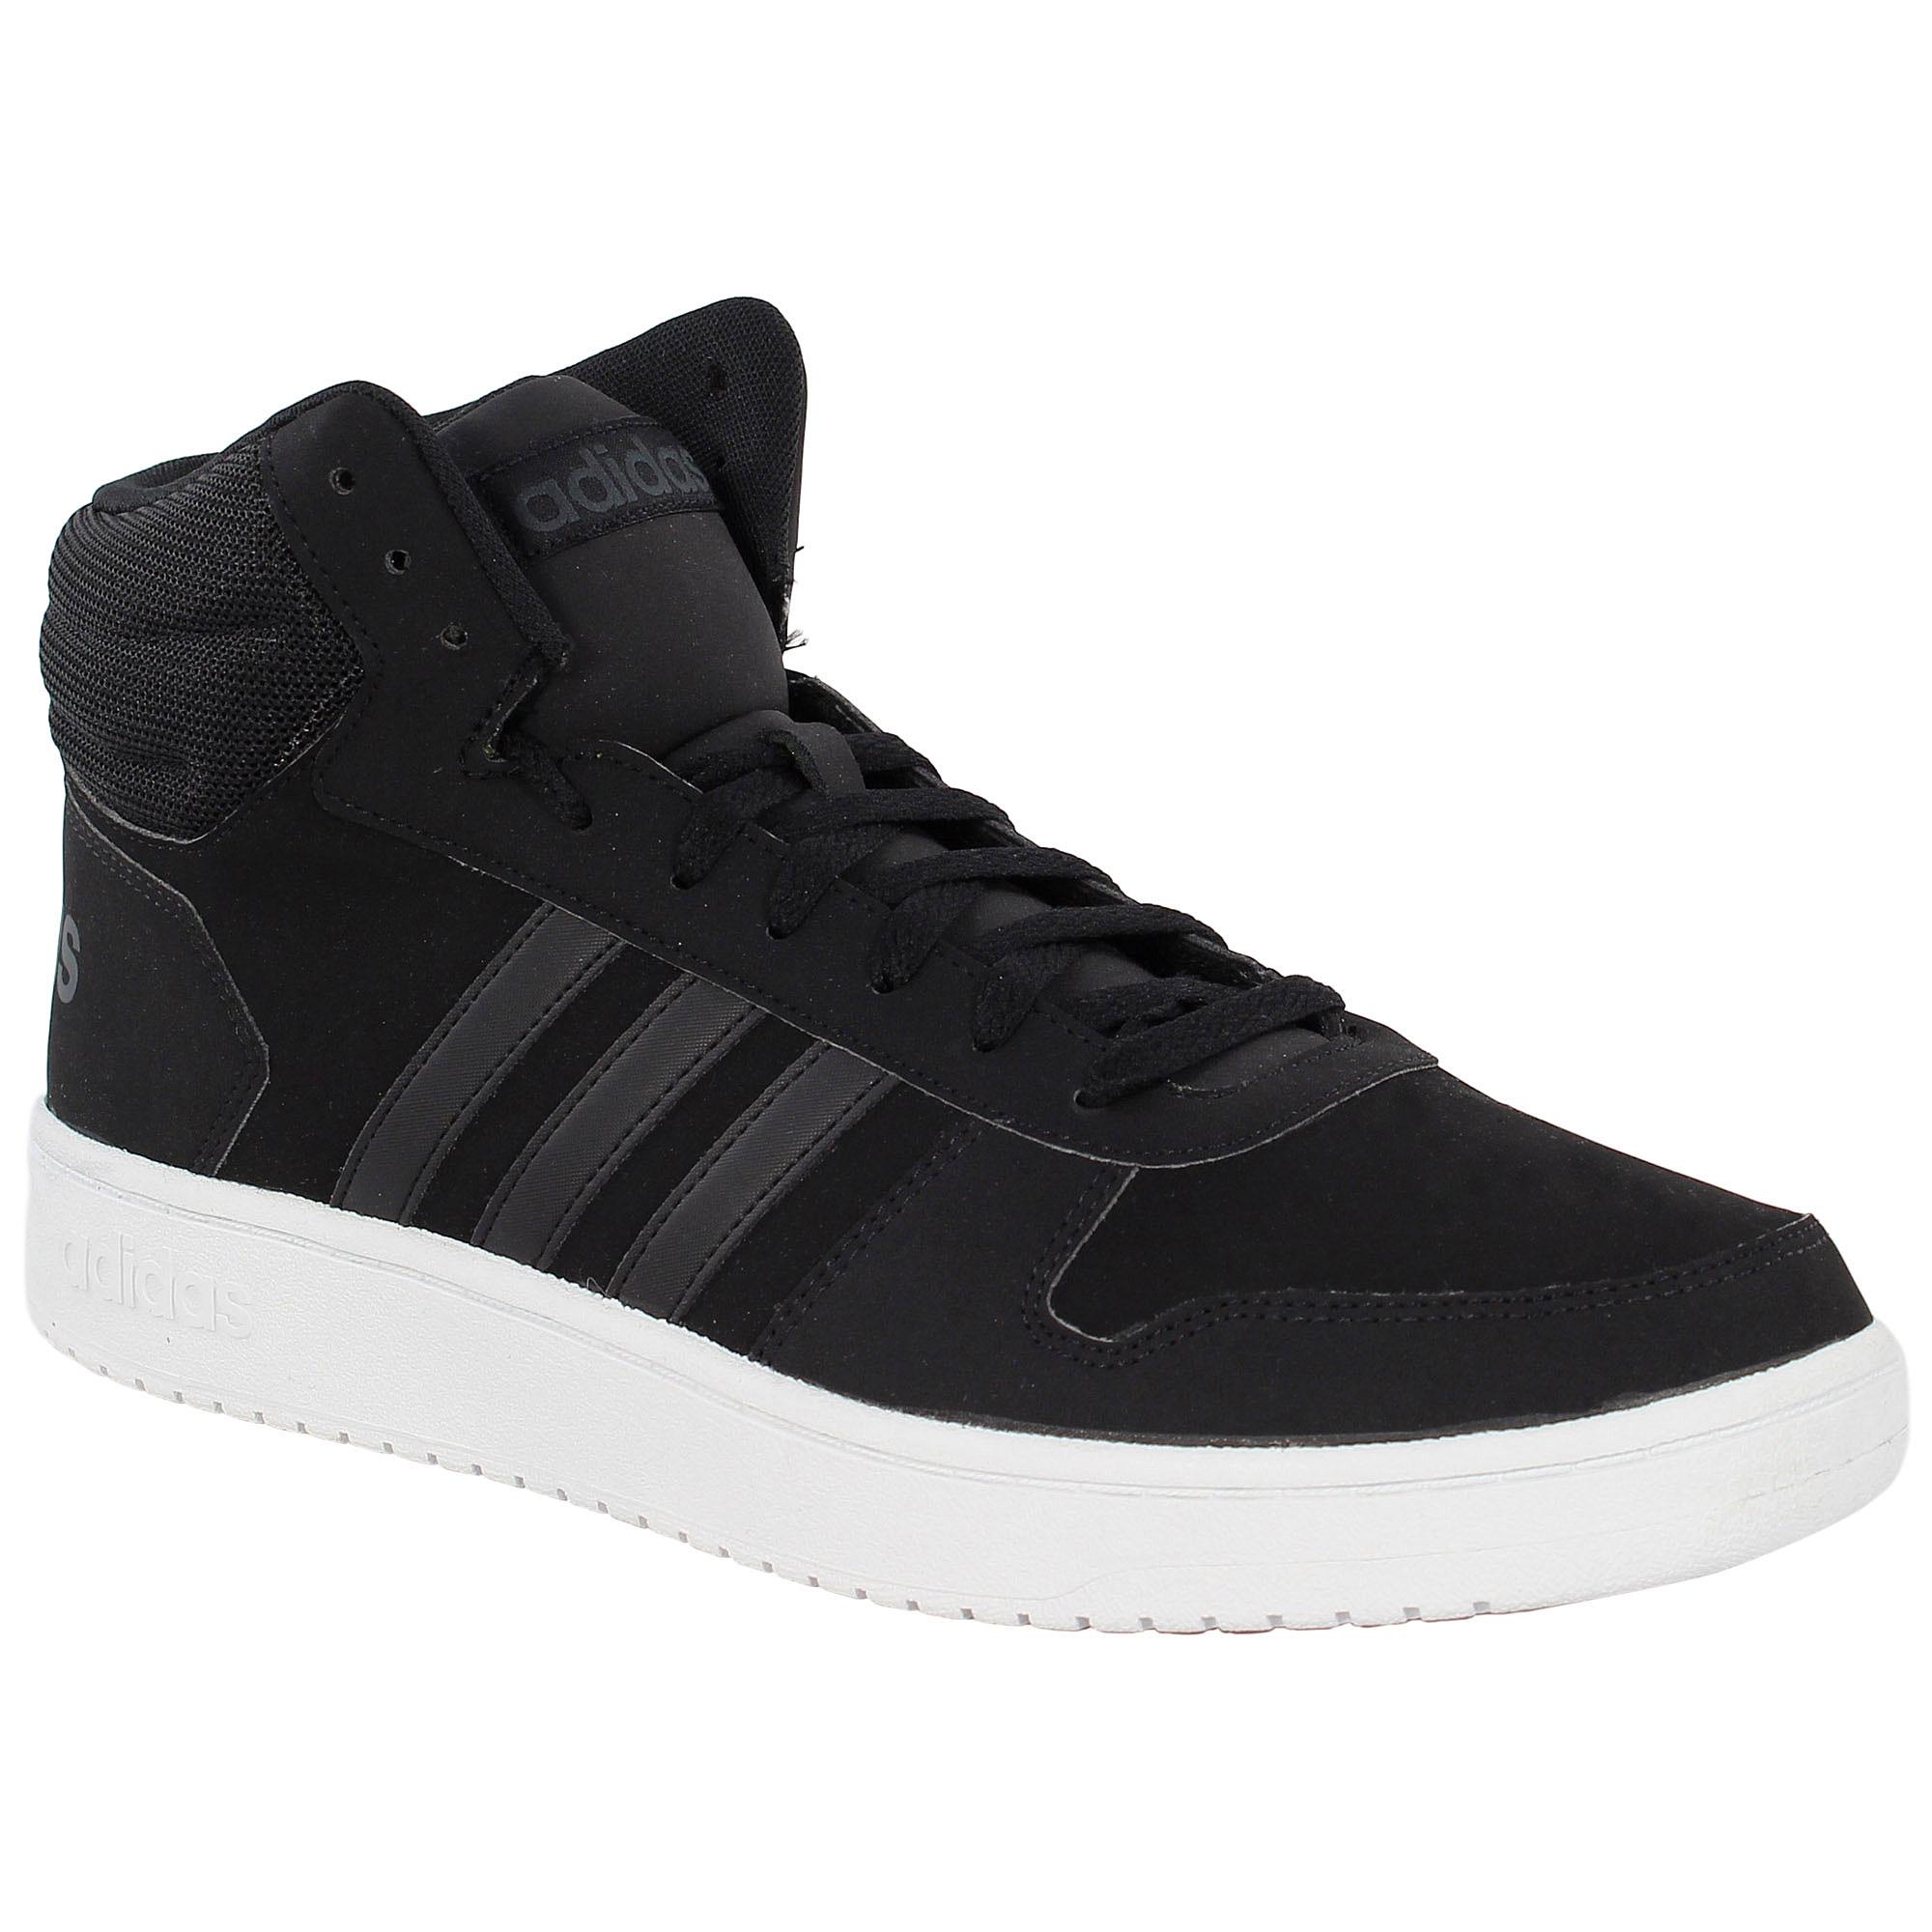 adidas Hoops Mid 2.0 Mens Basketball Shoes